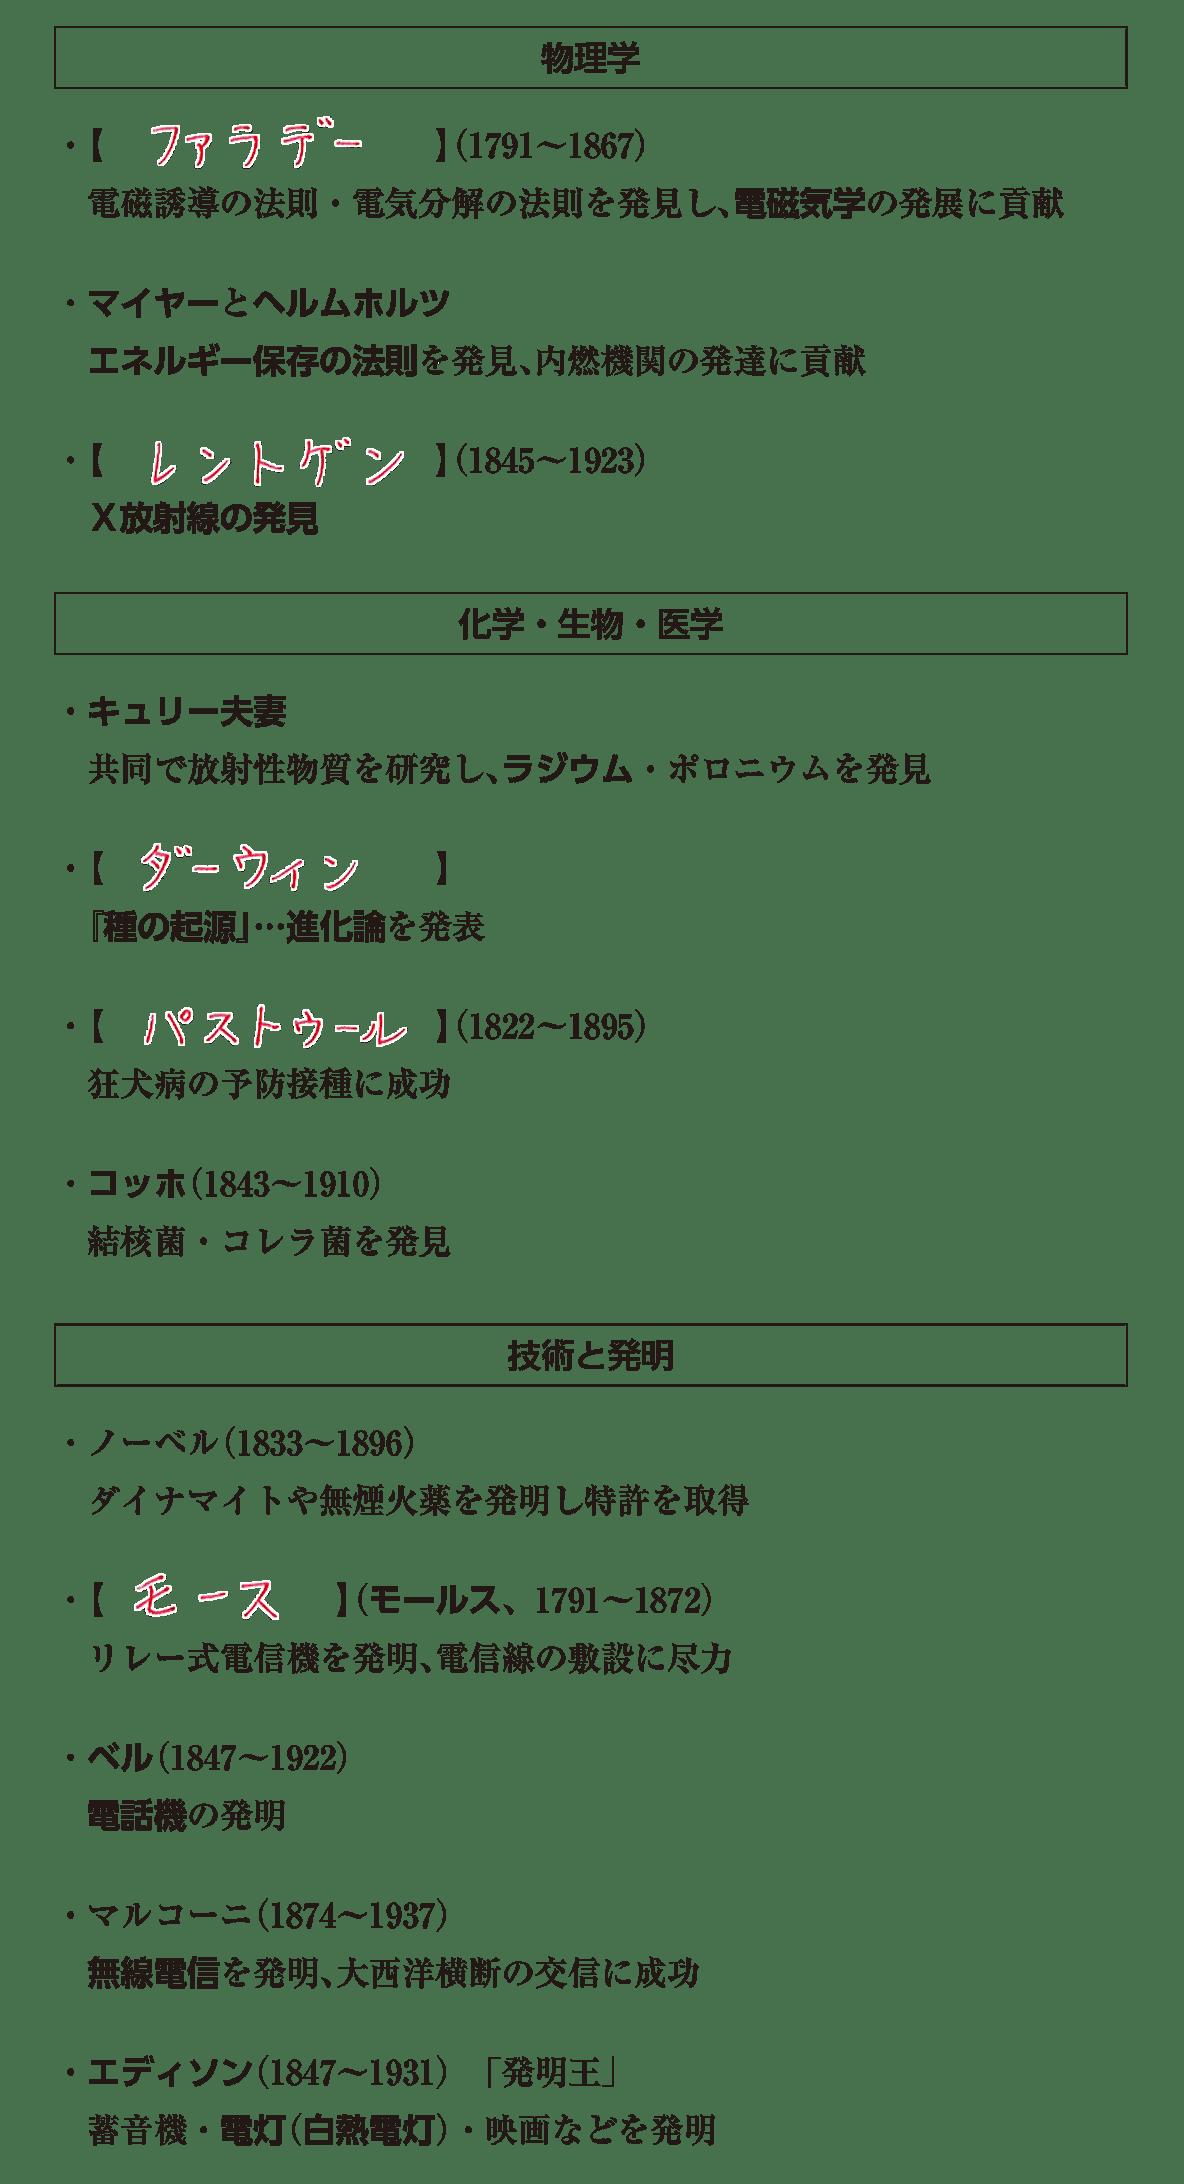 高校世界史 19世紀欧米諸国(3)4 ポイント3 答え全部